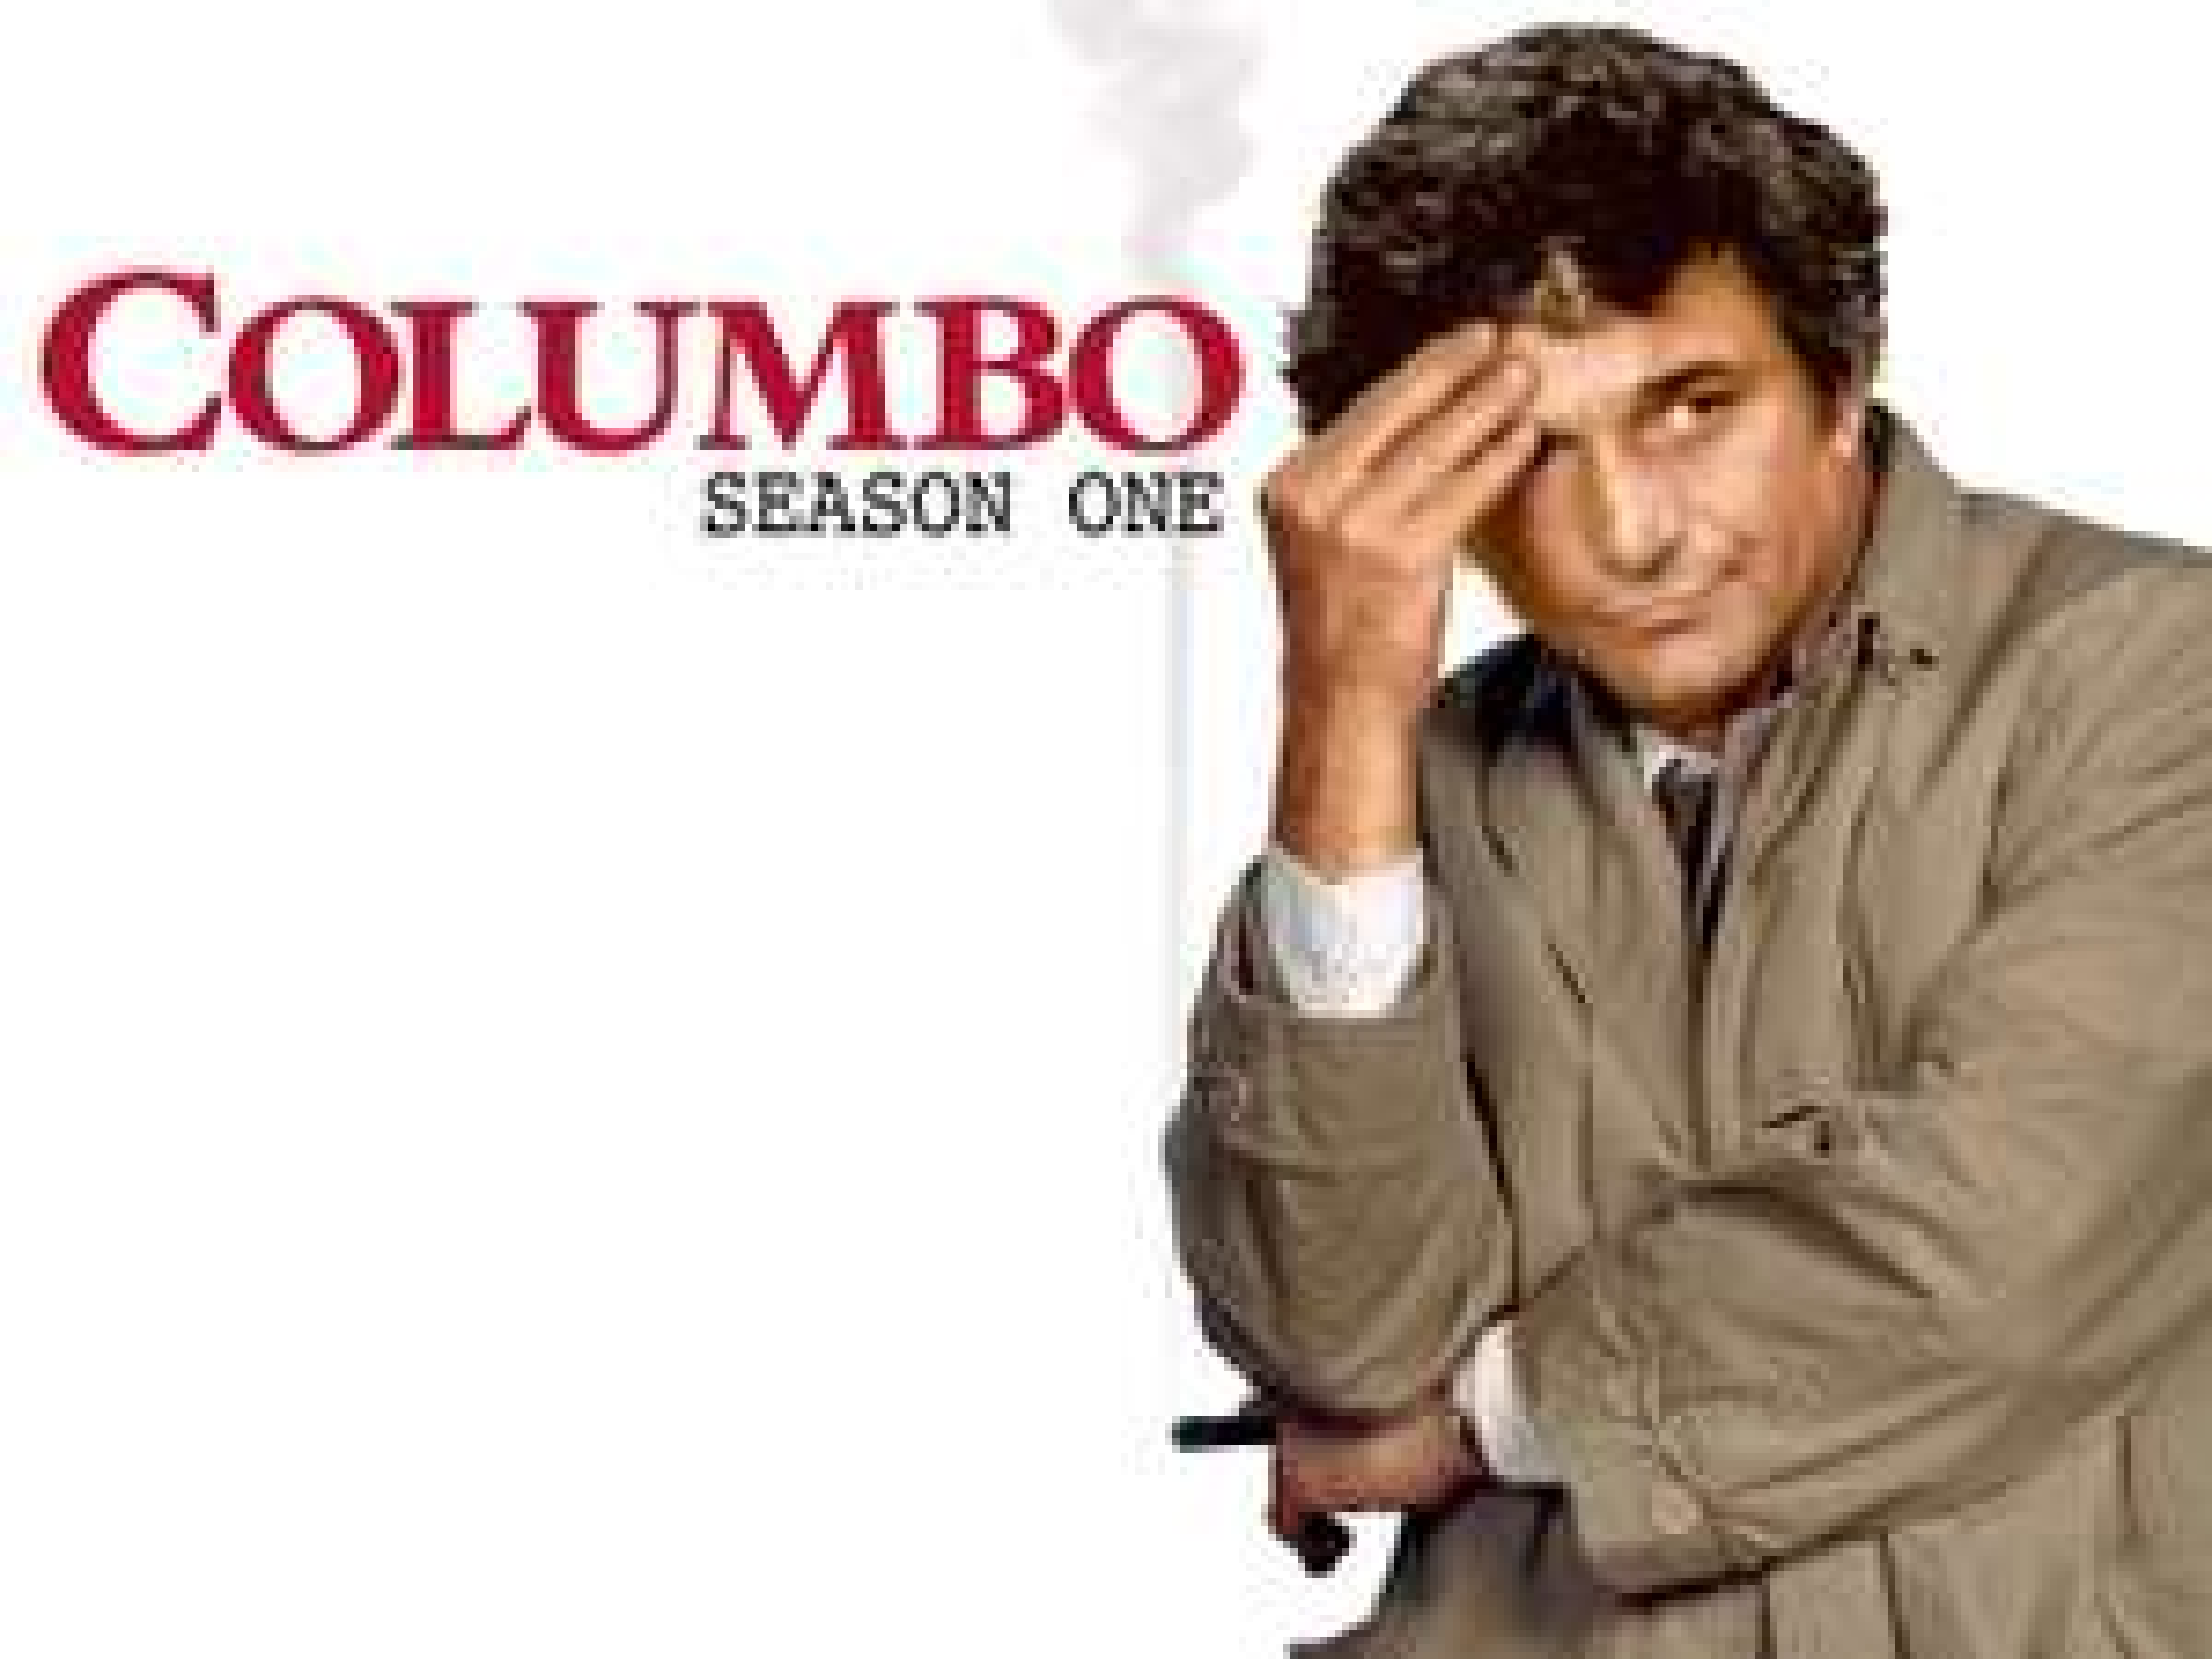 Columbo - Season 1 in HD £3.99 at Amazon Instant Video